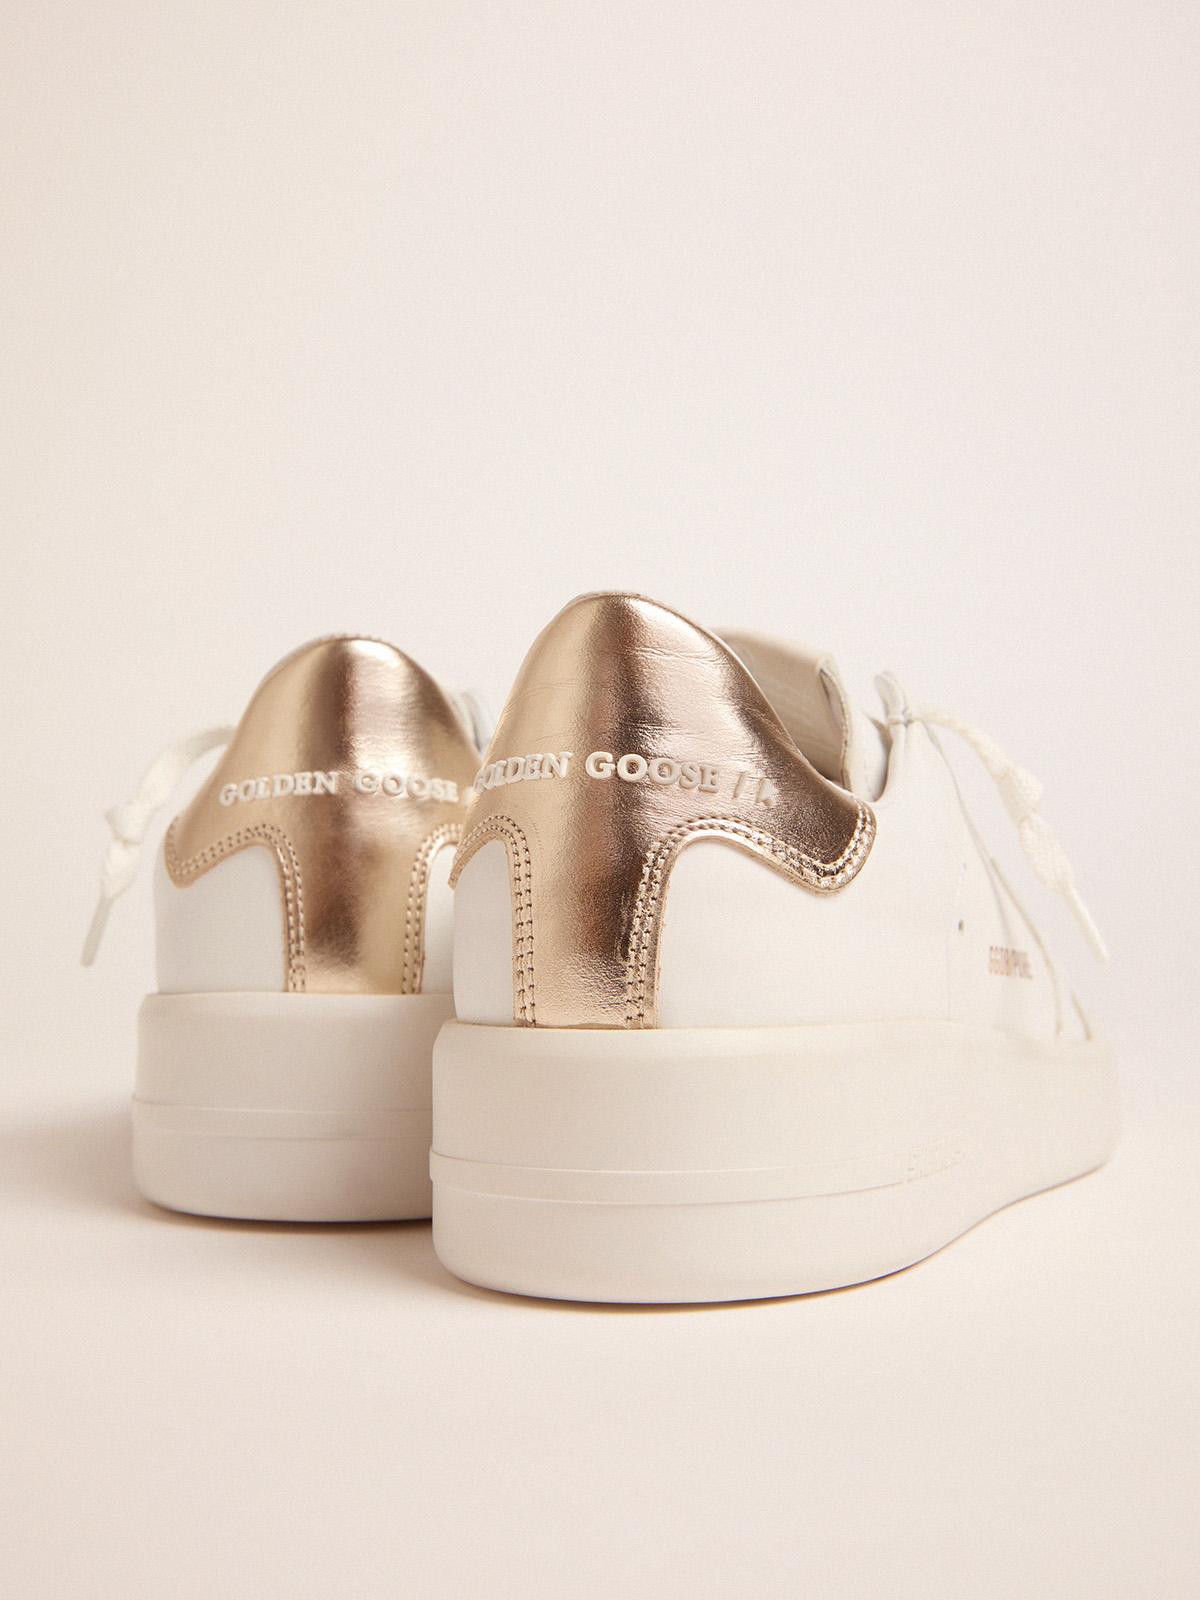 Golden Goose - Women's PURESTAR sneakers with gold-coloured heel tab in